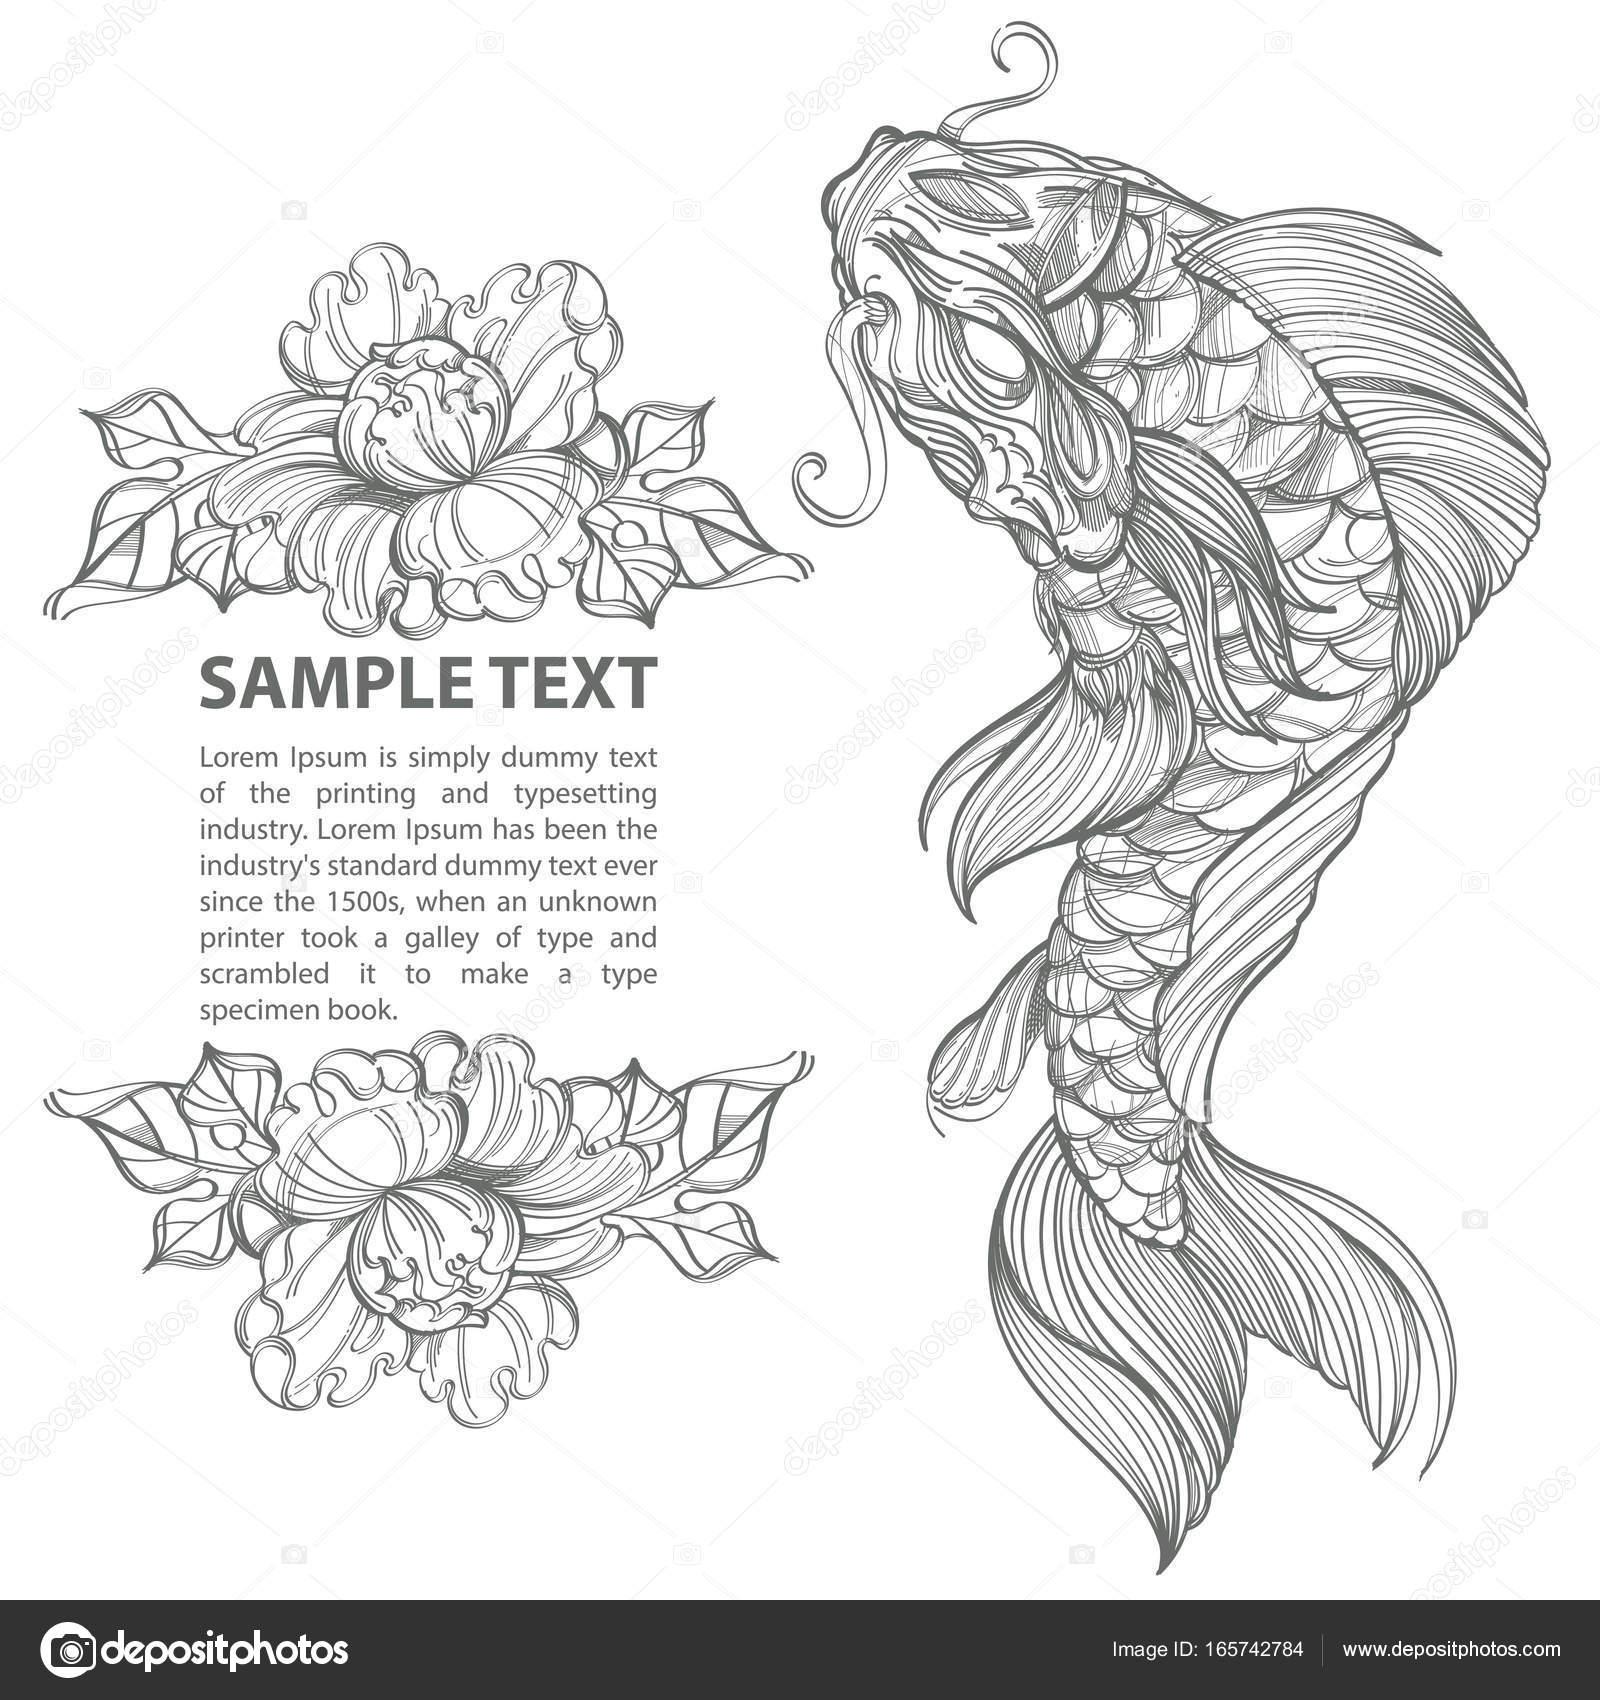 Depositphotos 165742784 Stock Illustration Contour Koi Fish With Flower